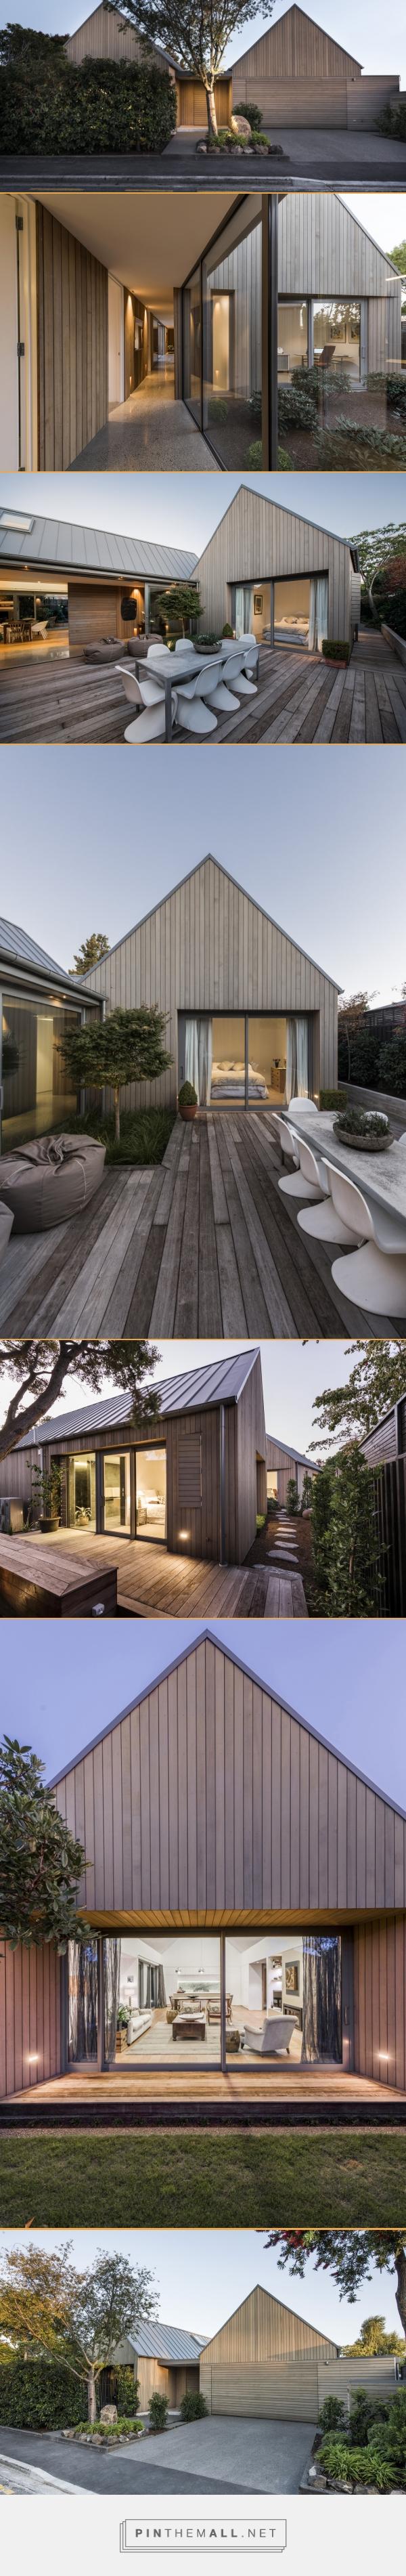 Christchurch House   Design Addicts Platform   Australiau0027s Most Popularu2026  Cabin DesignHouse DesignContemporary ArchitectureArchitecture ...